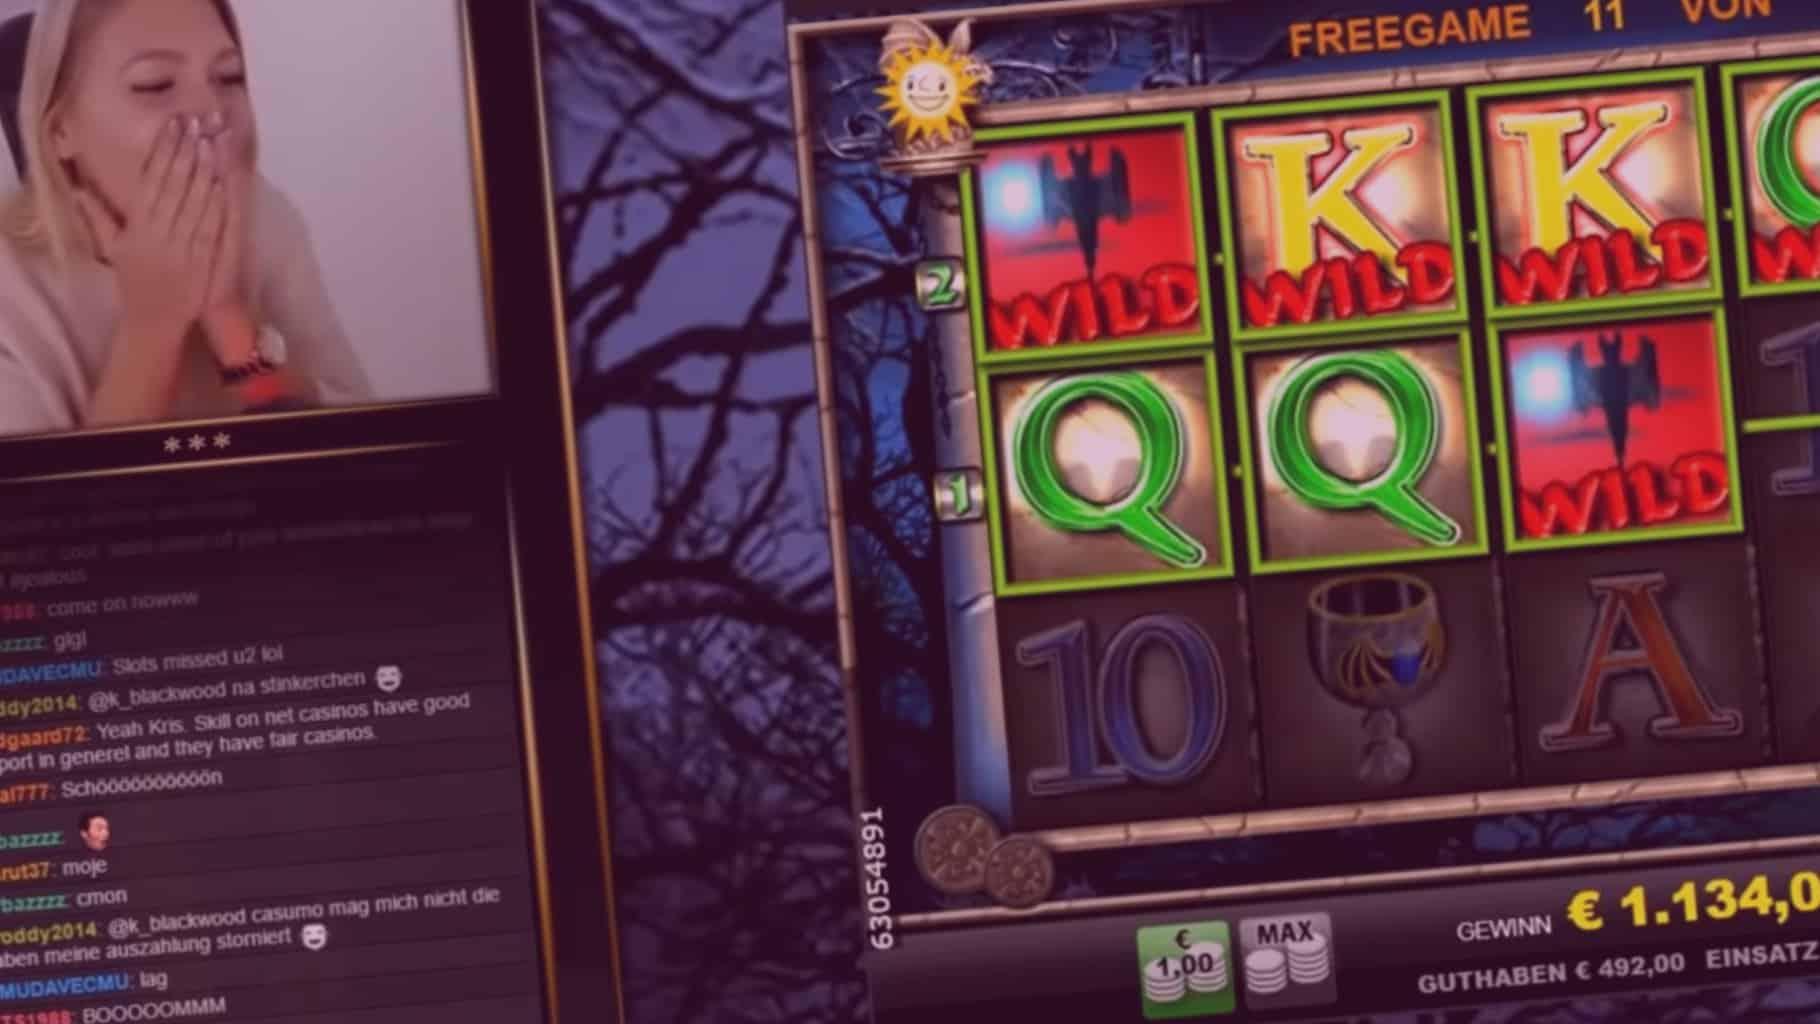 Welcome to k_blackwod to CasinoGrounds!